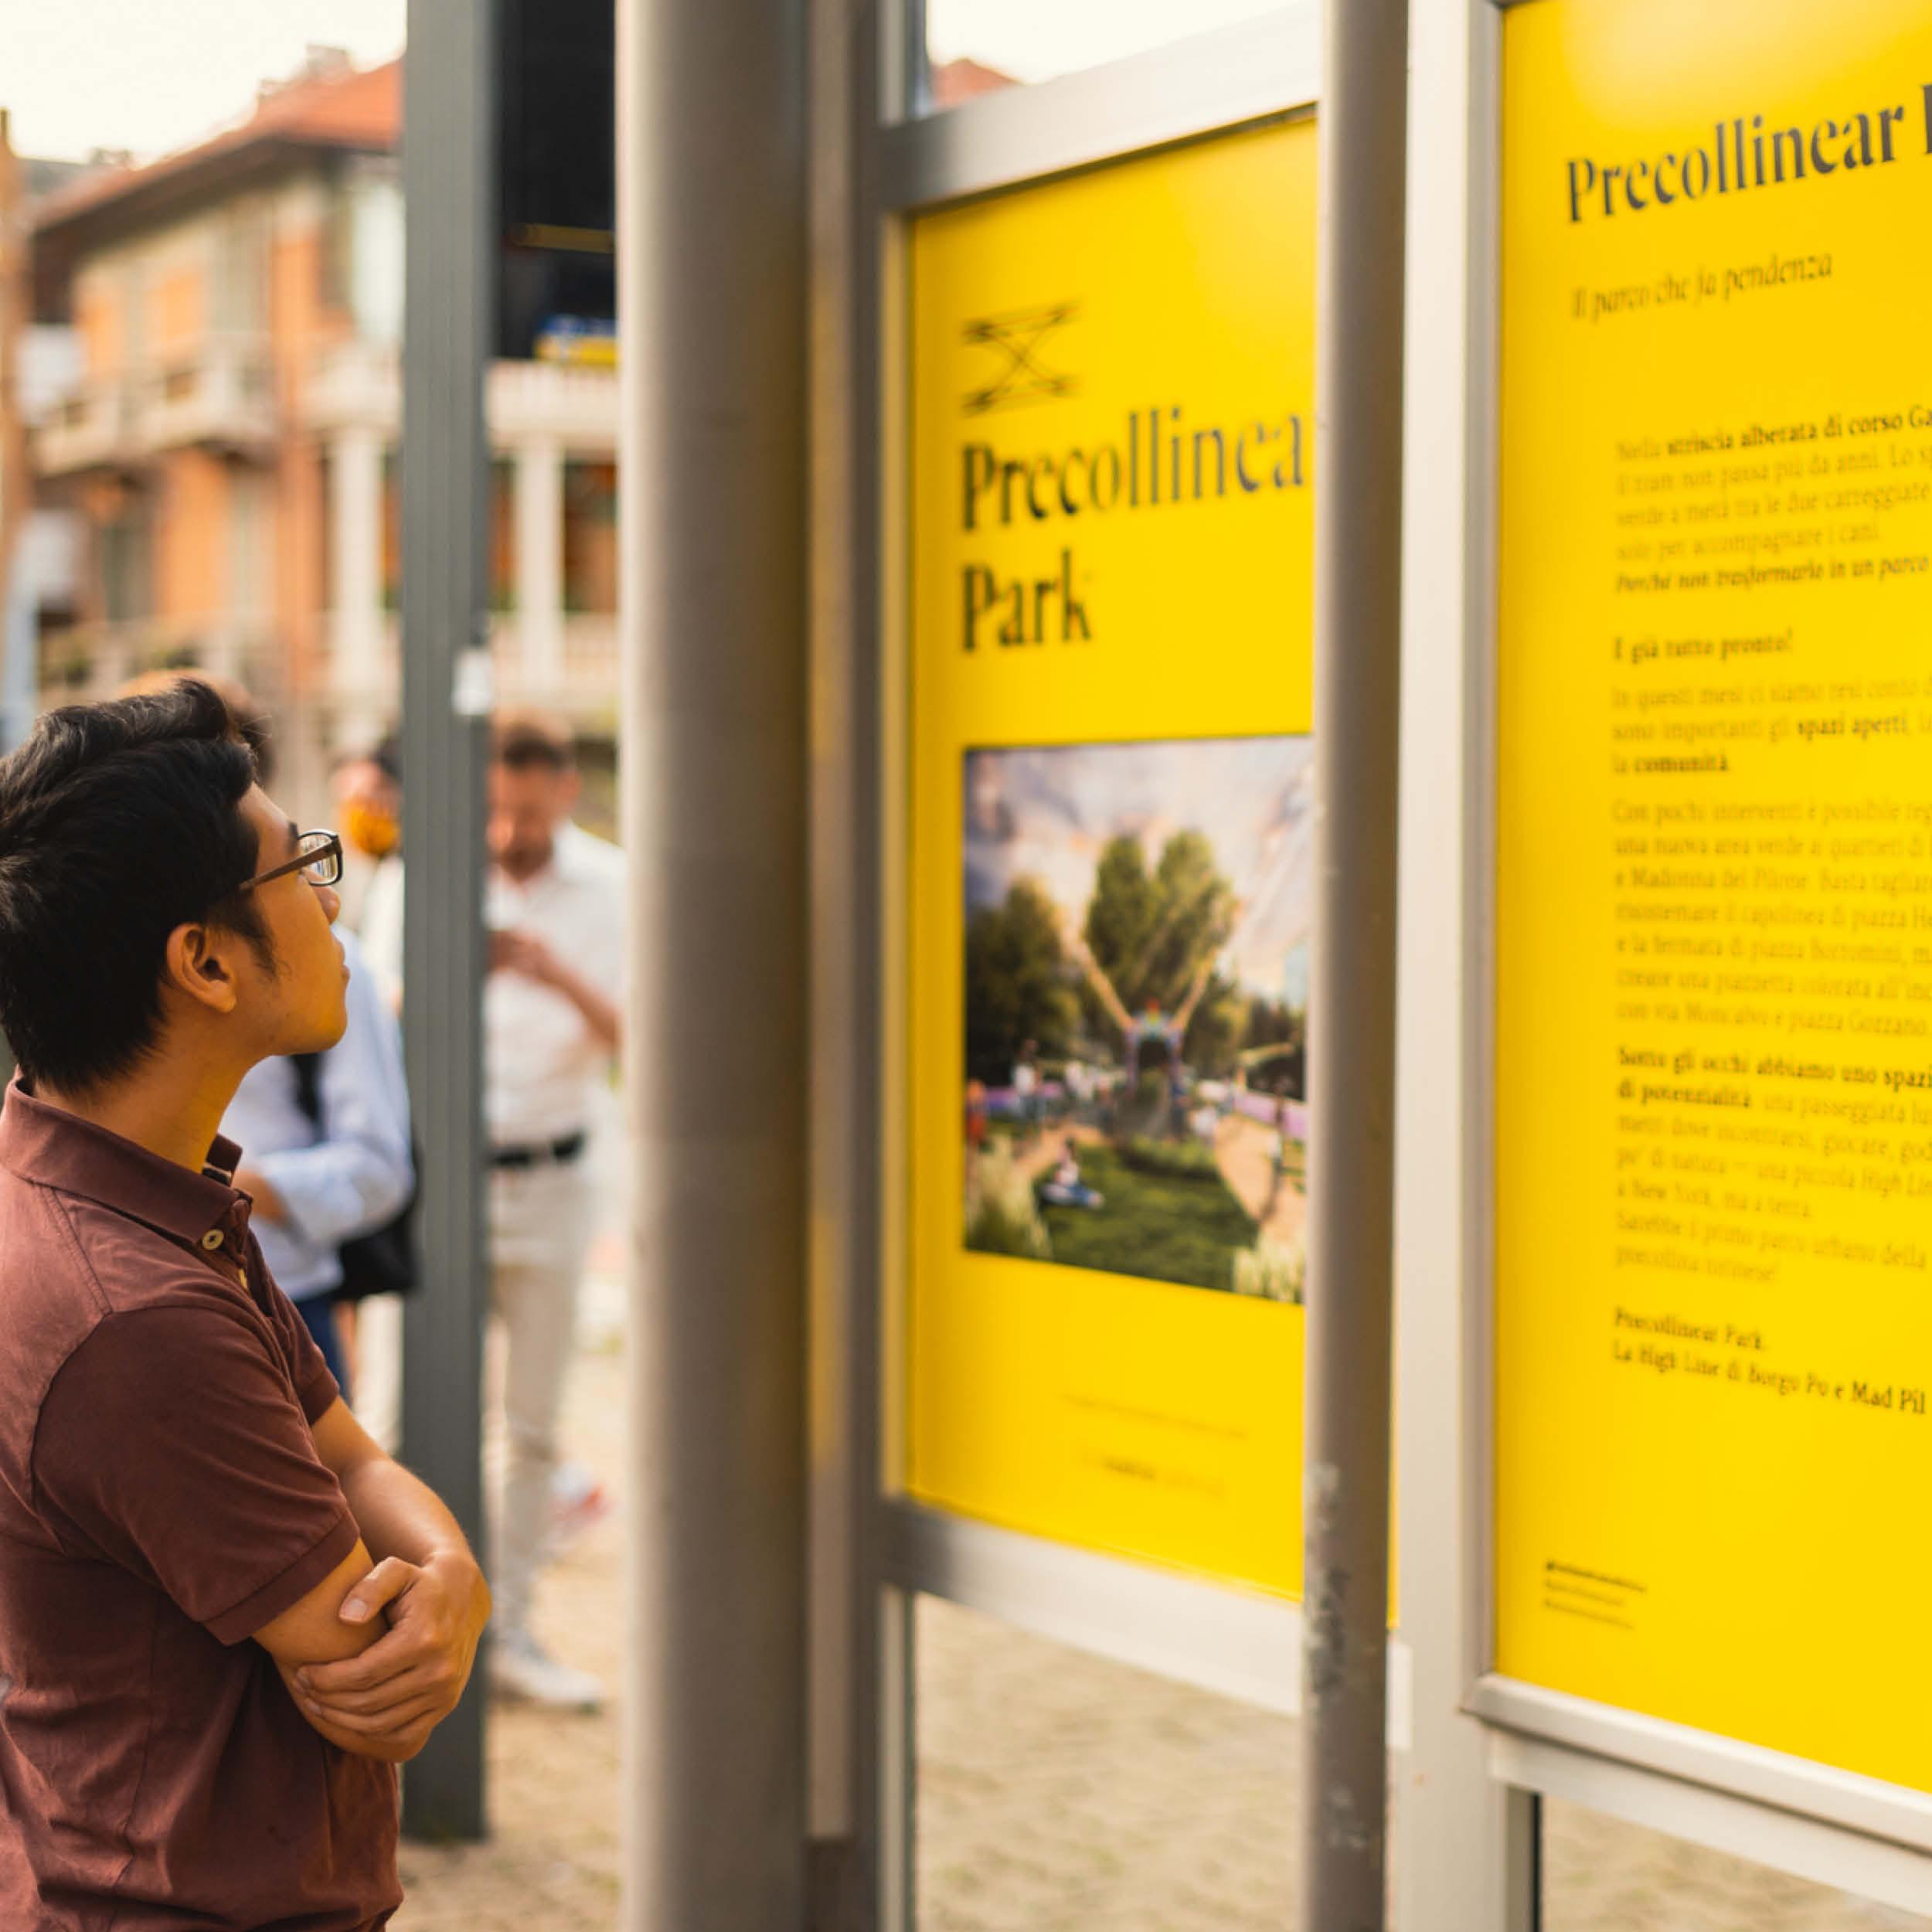 OHT-Precollinear-Park6